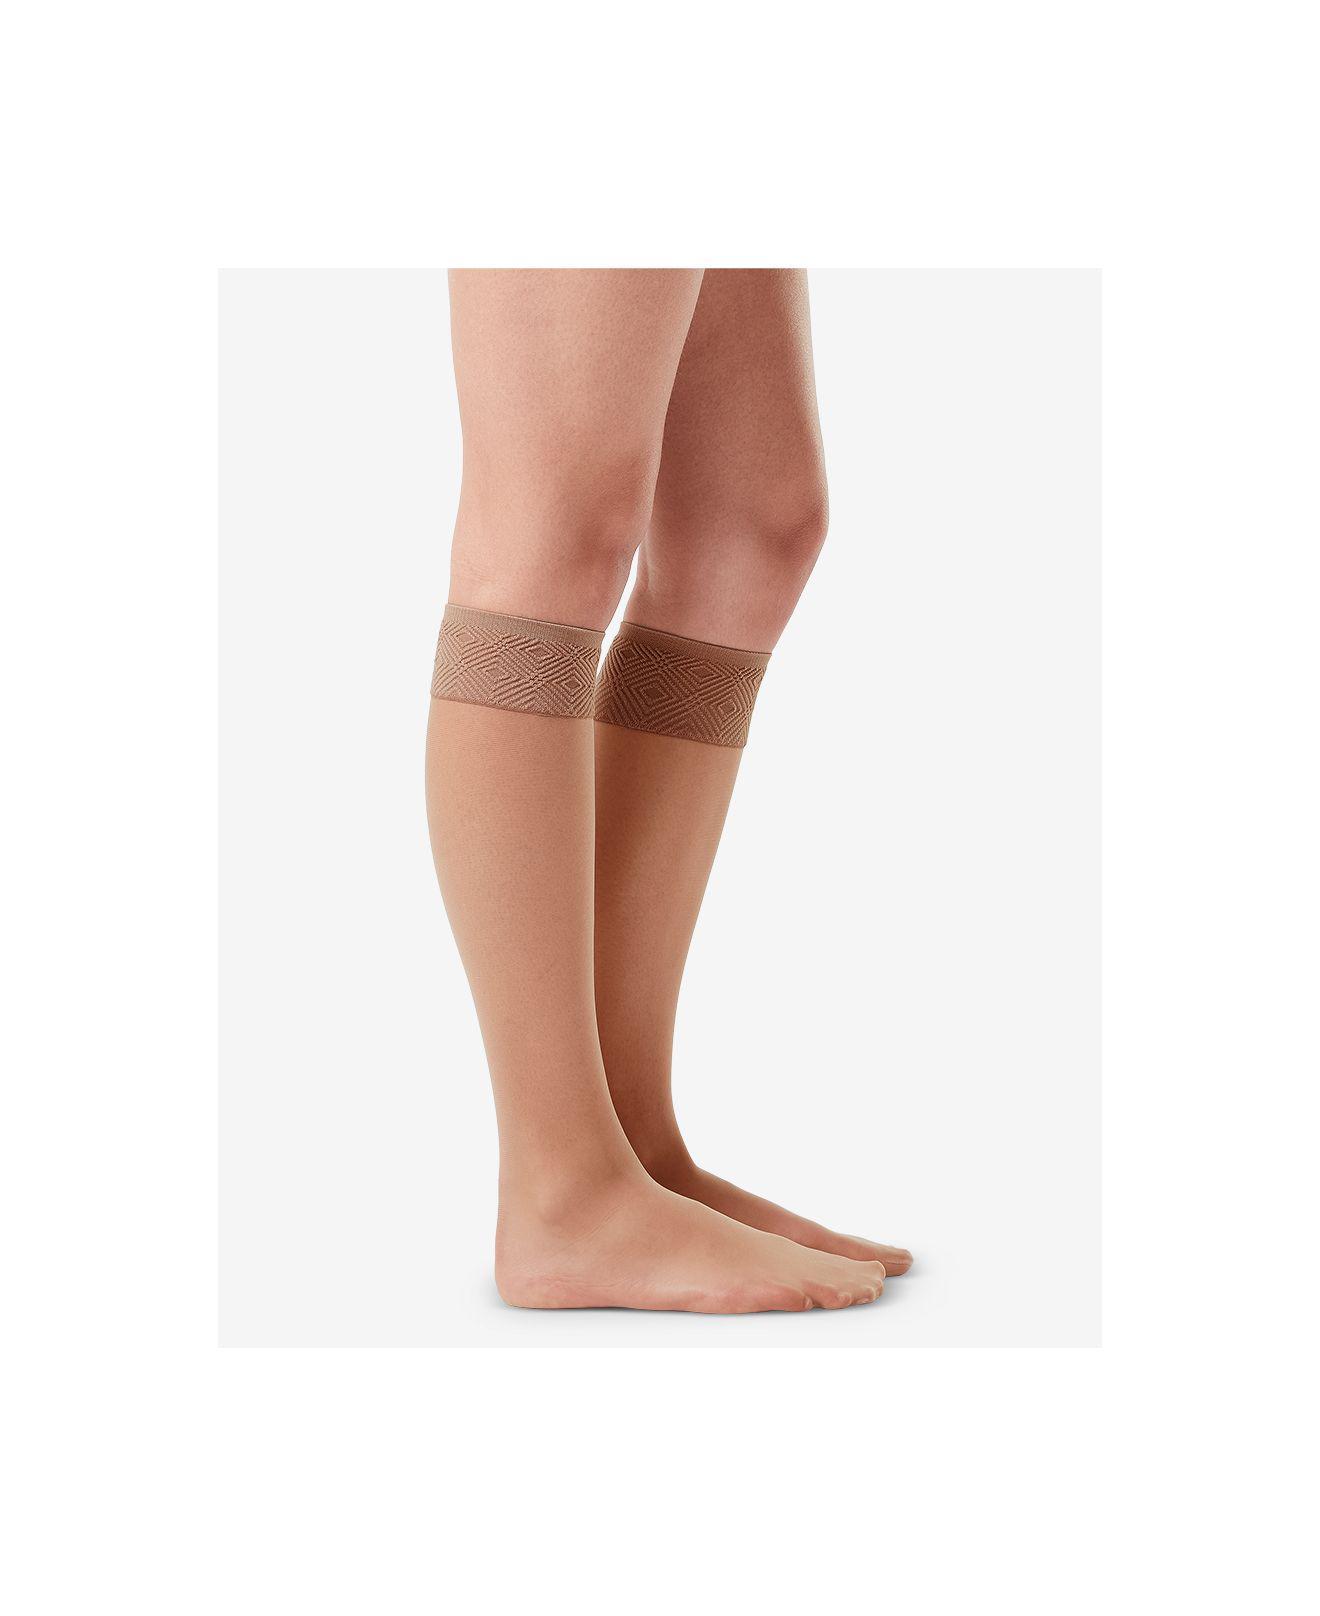 64a61005cde Lyst - Spanx ® Hi-knees Knee-high Socks